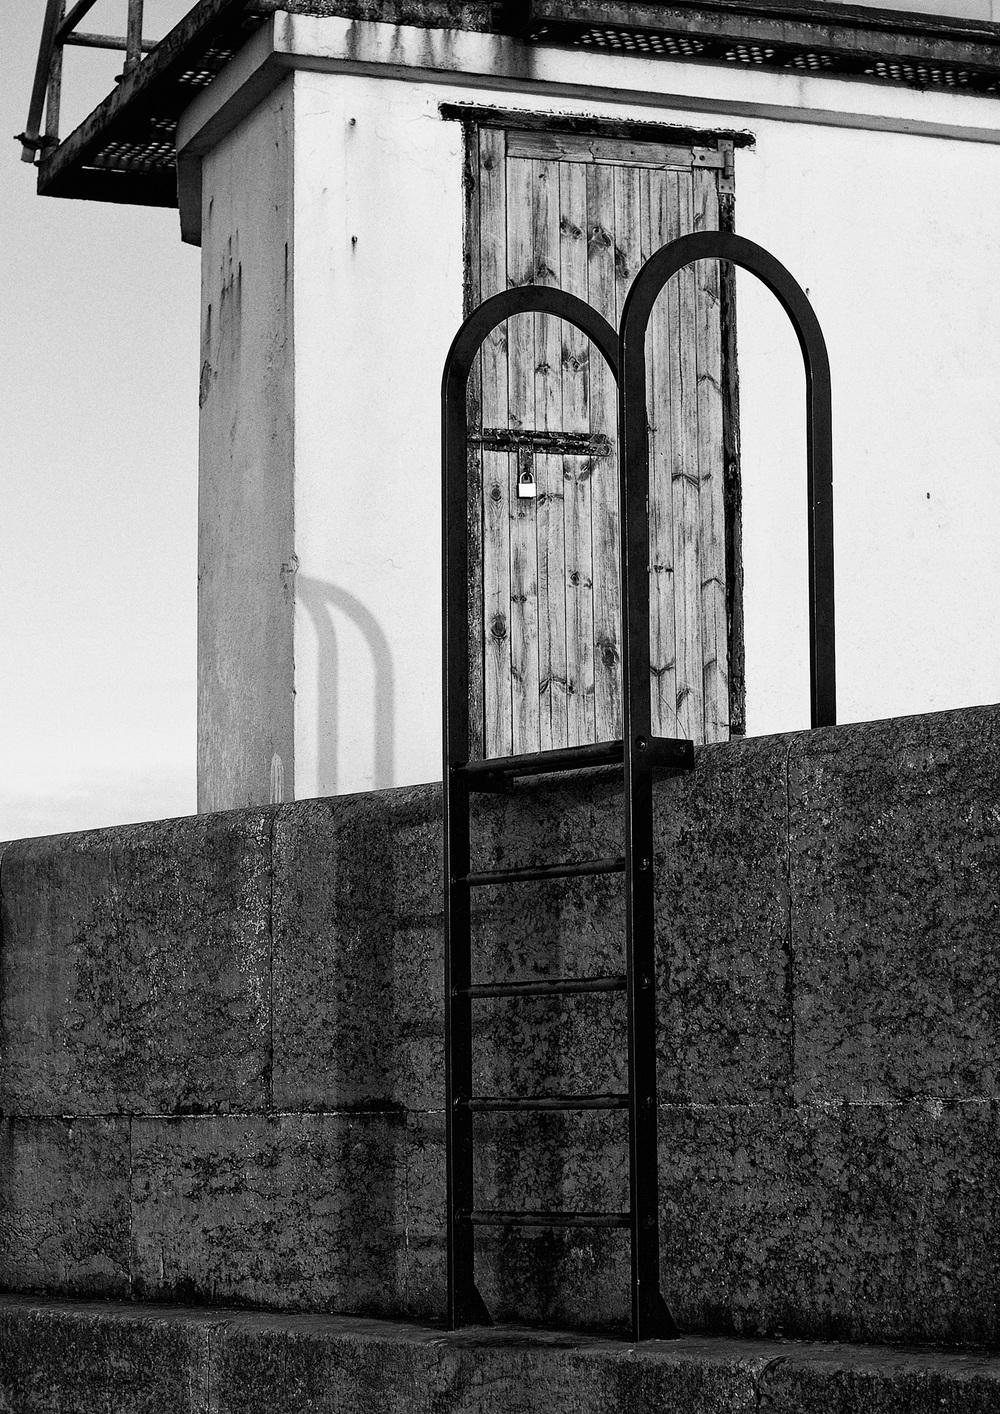 21-Fine-Art-&-Landscape-Photography-by-Geoff-McGrath-Donaghadee,-County-Down,-Northern-Ireland.jpg